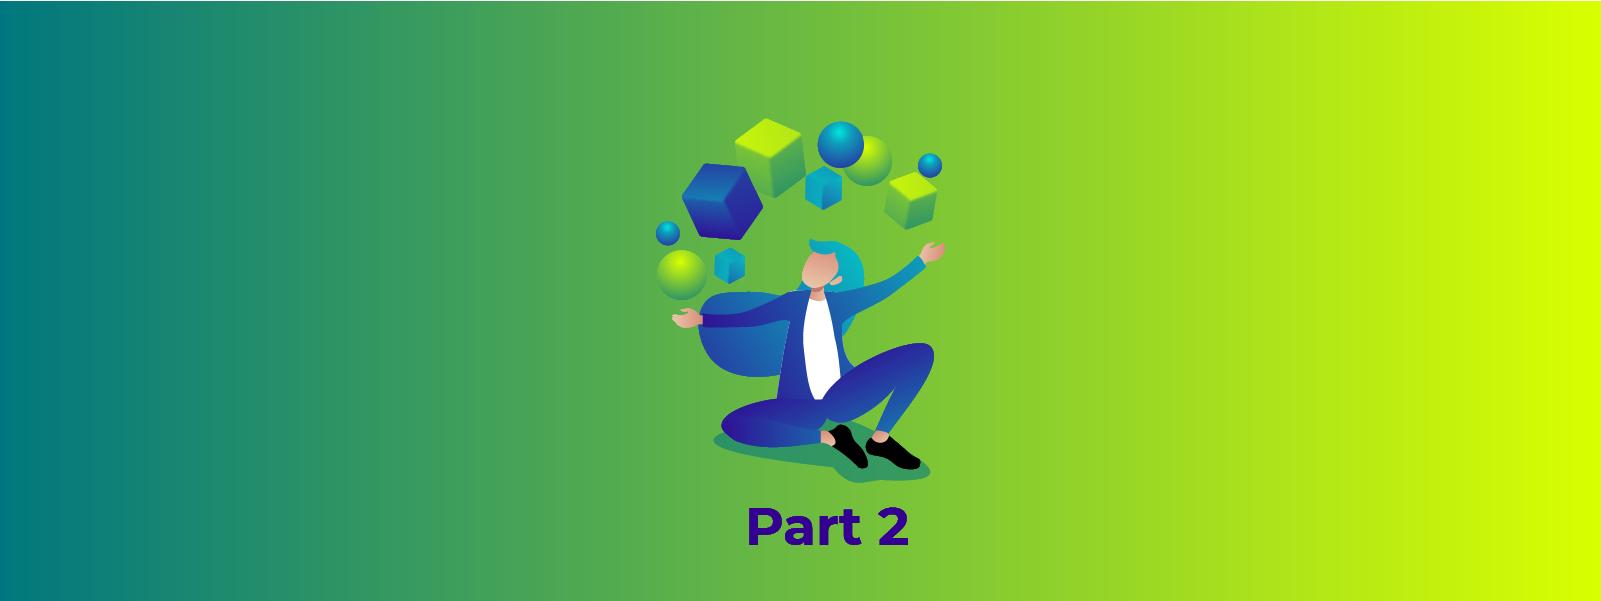 B-enjeux-objectifs-projet-datagouv-2